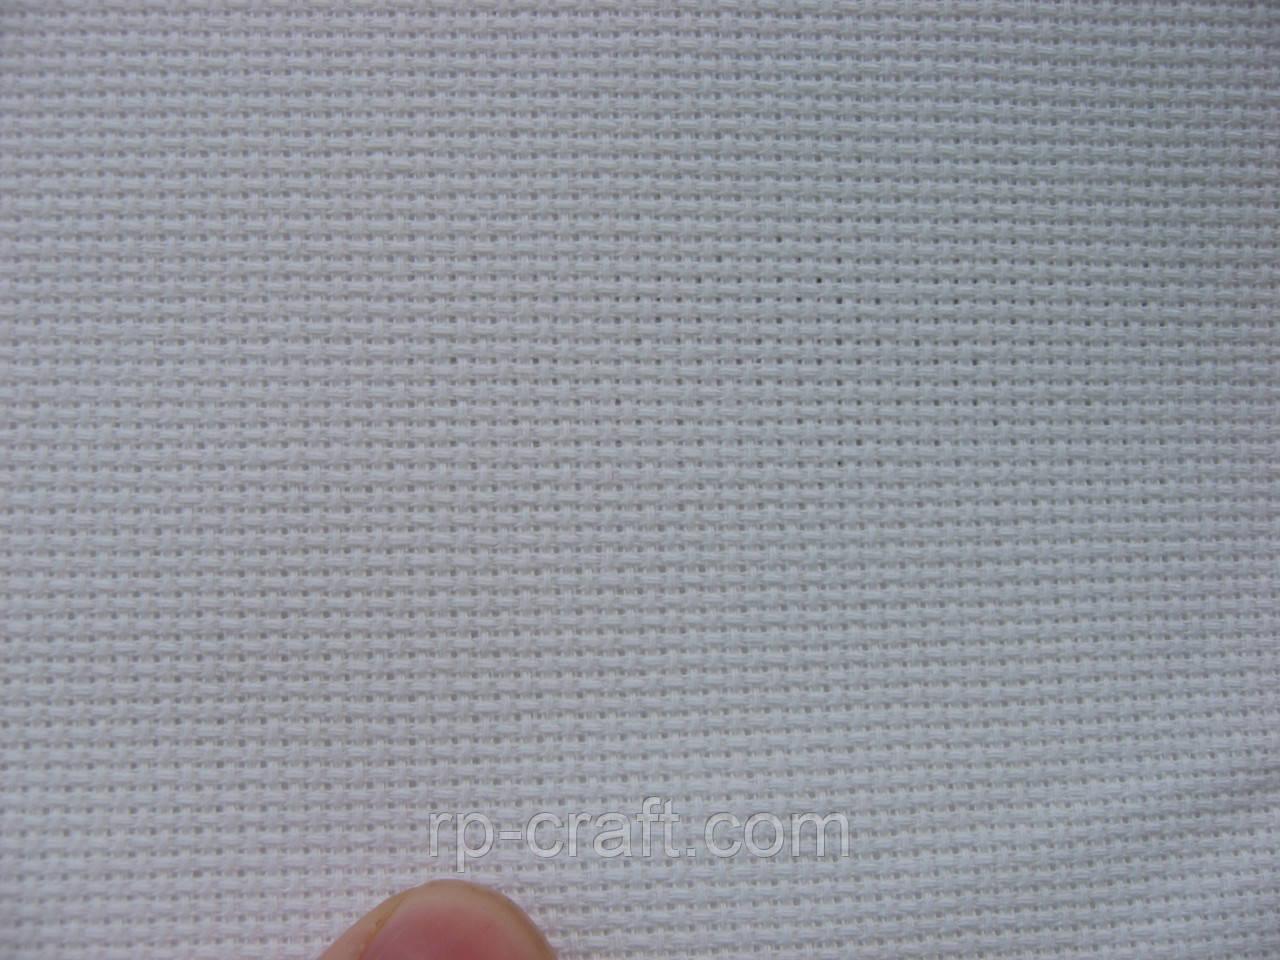 Отрез ткани для вышивки. Аида 18 каунт, белая, 29х35 см